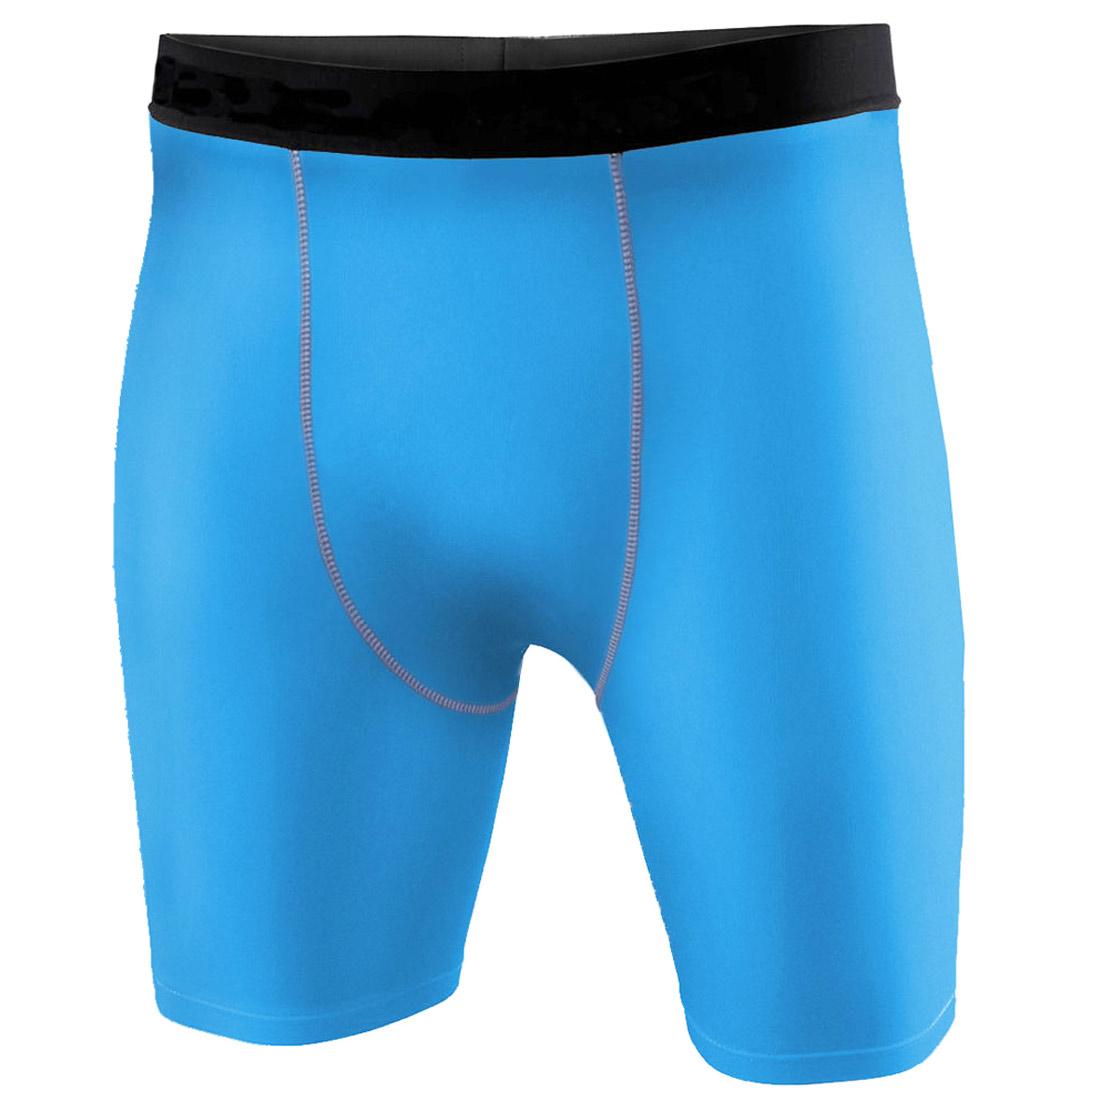 Mens Sports Compression Shorts Pants Shirts Workout Base